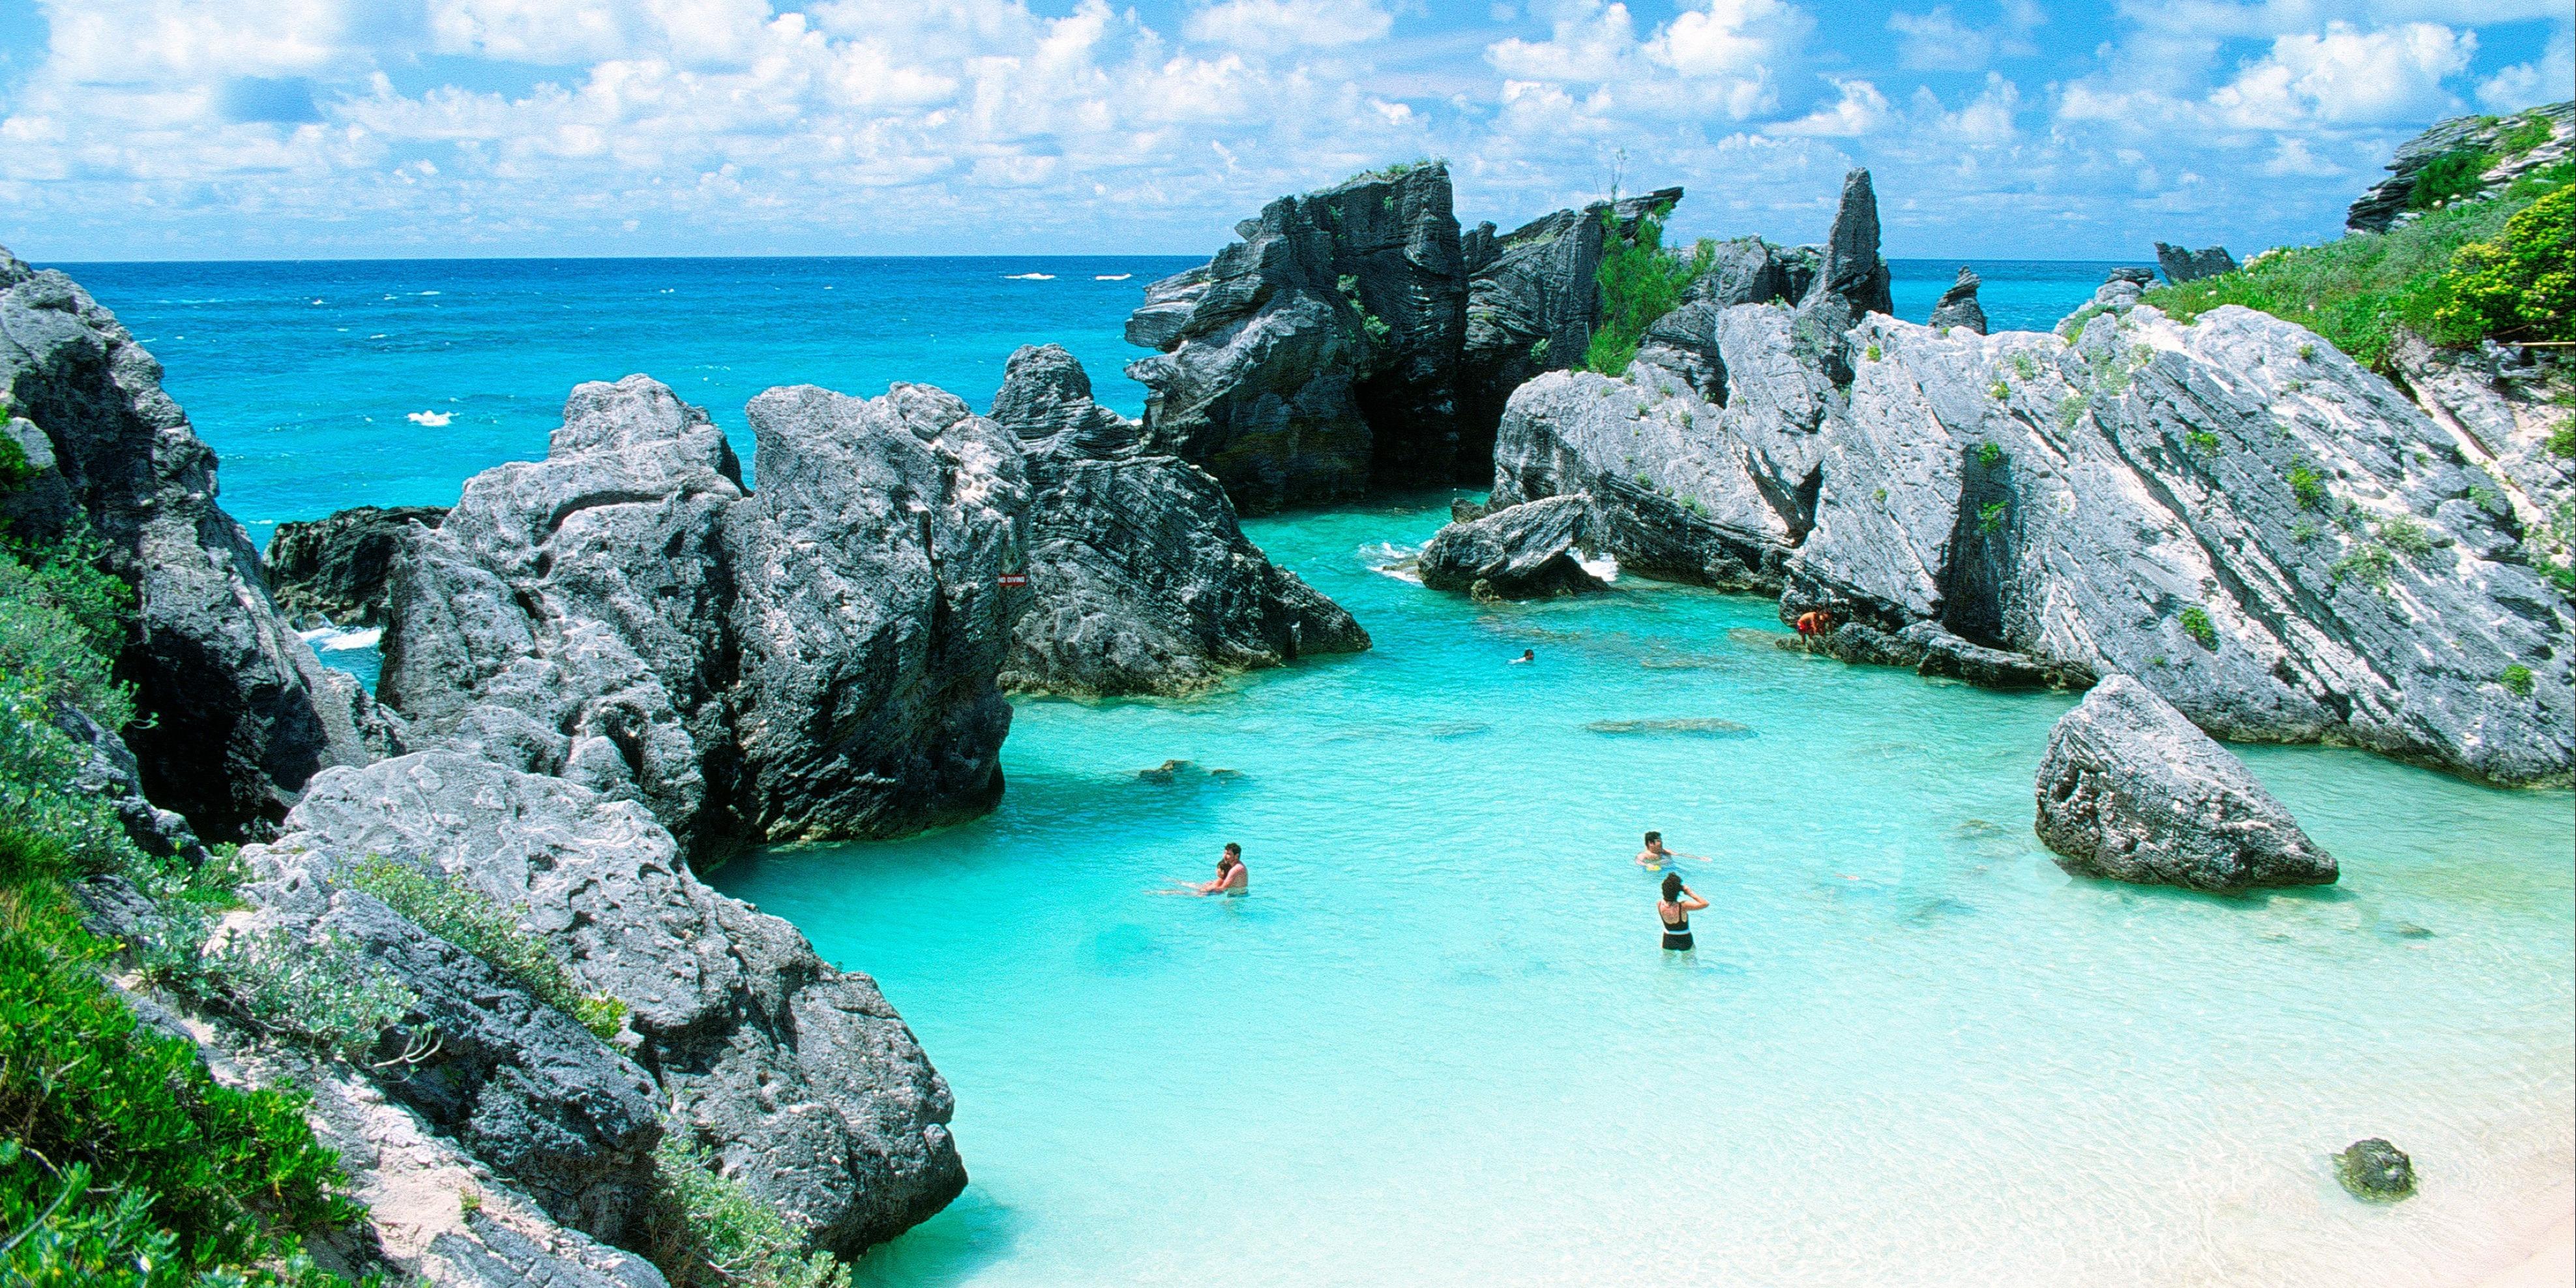 bermuda-travel-guide-americas-cup